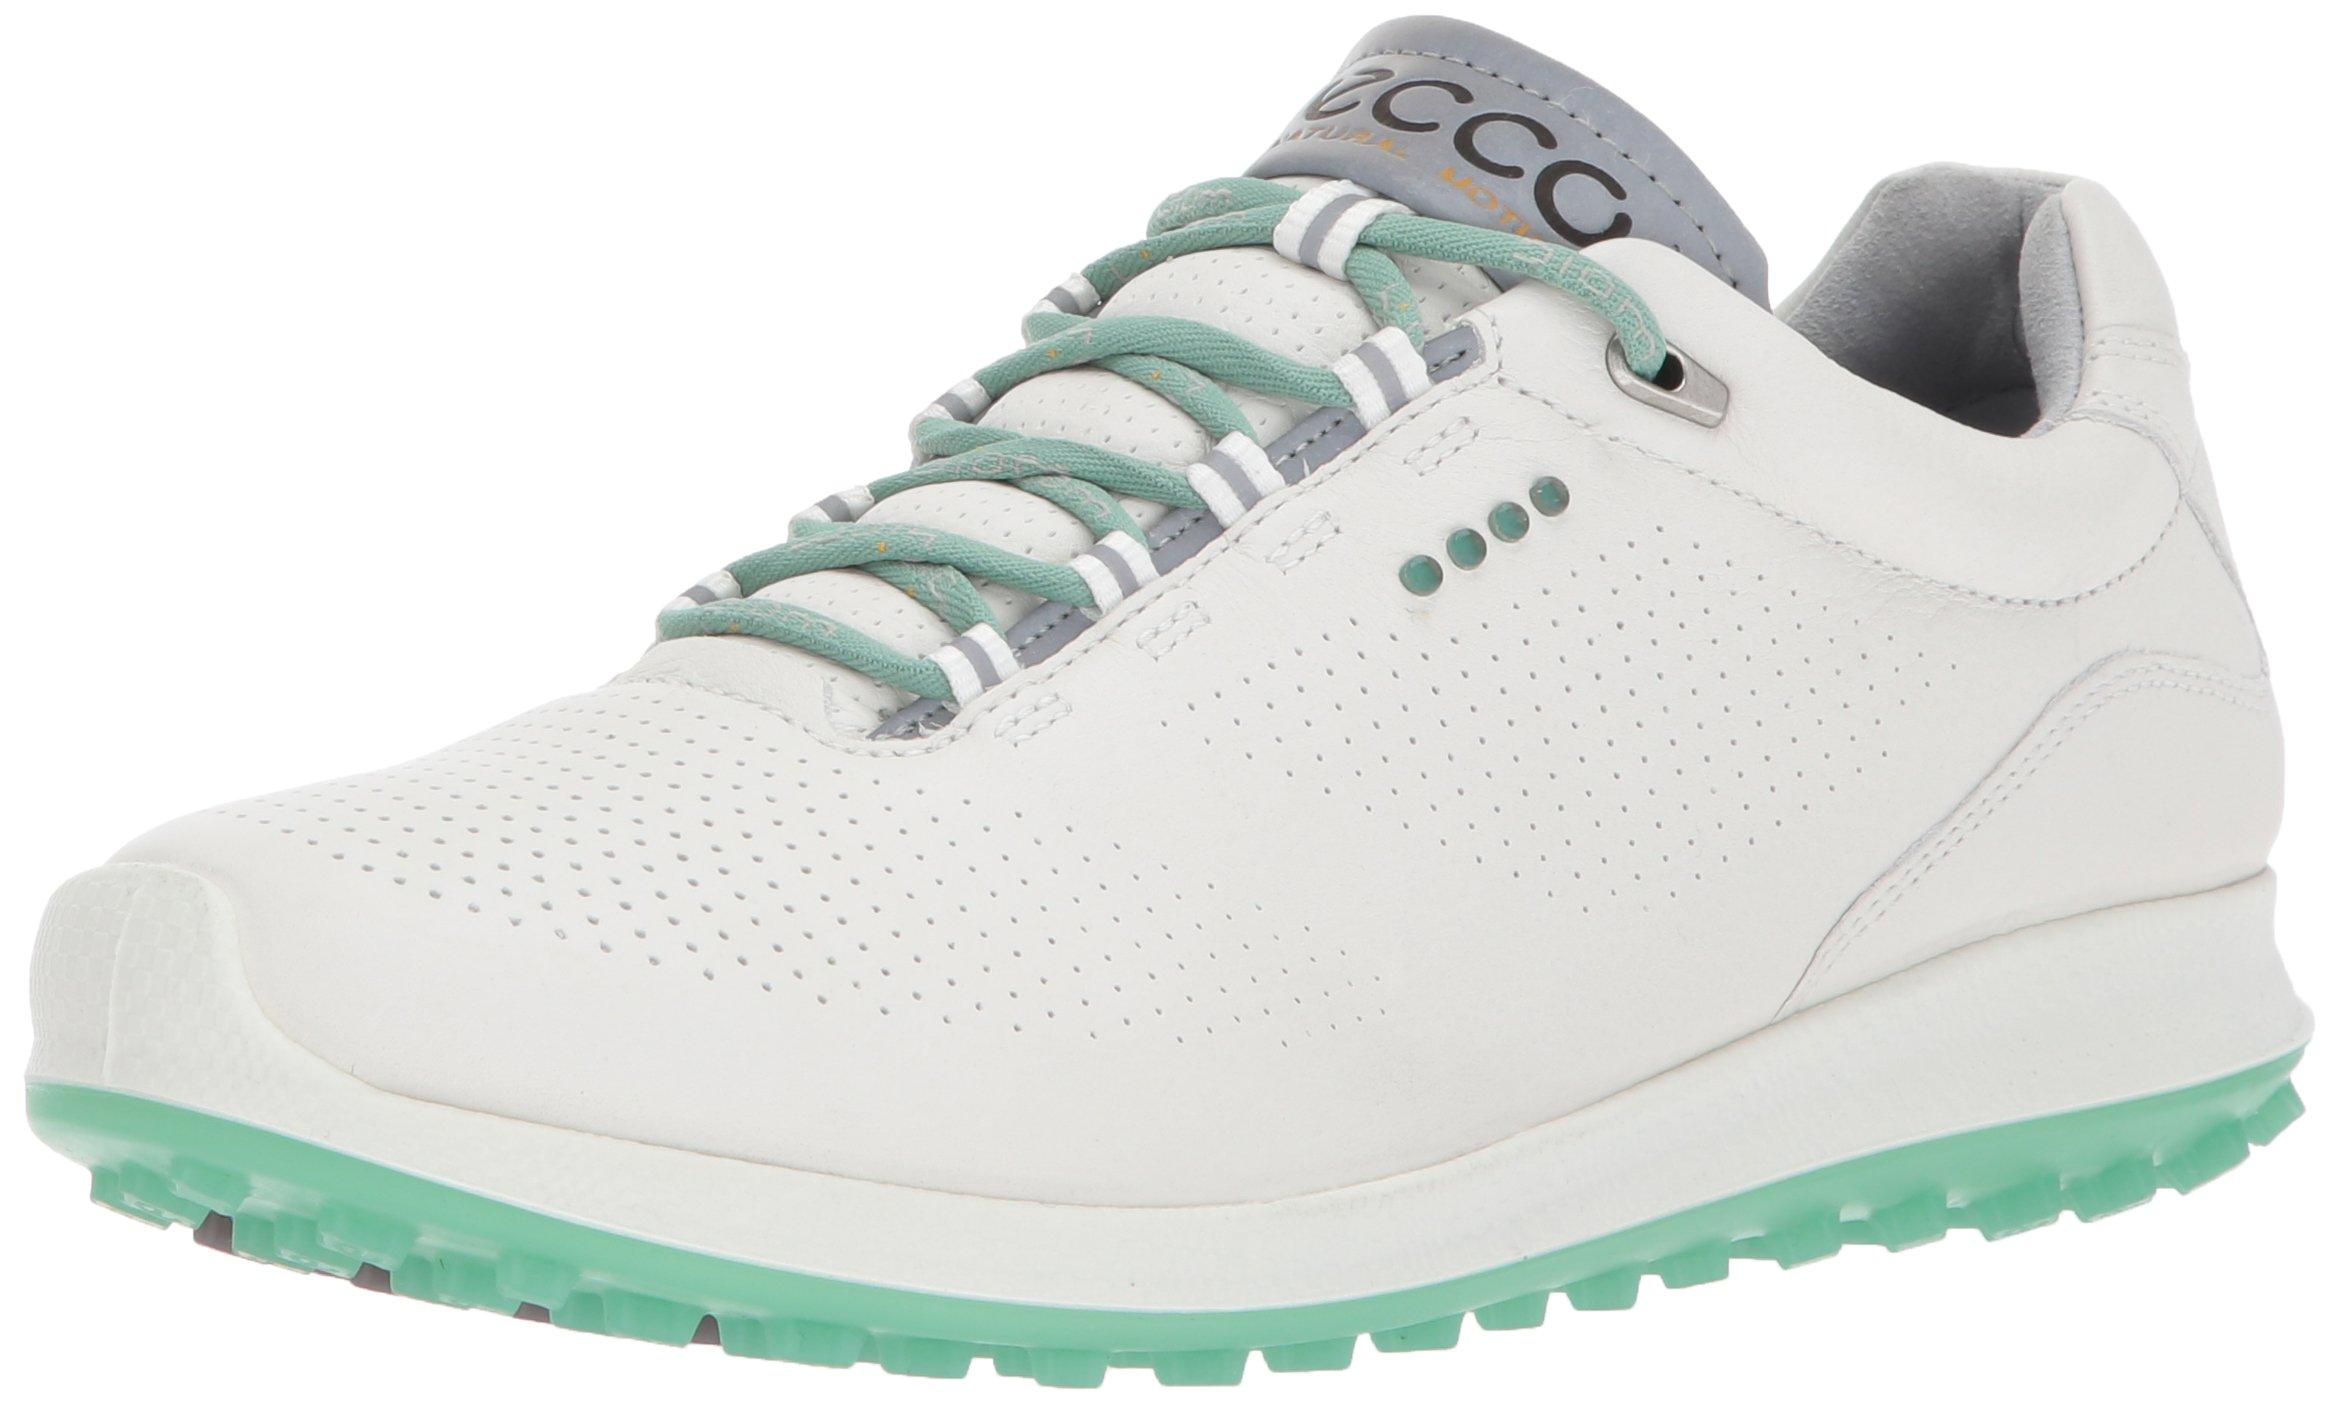 ECCO Women's Biom Hybrid 2 Perforated Golf Shoe, White/Granite Green, 39 EU/8-8.5 B(M) US